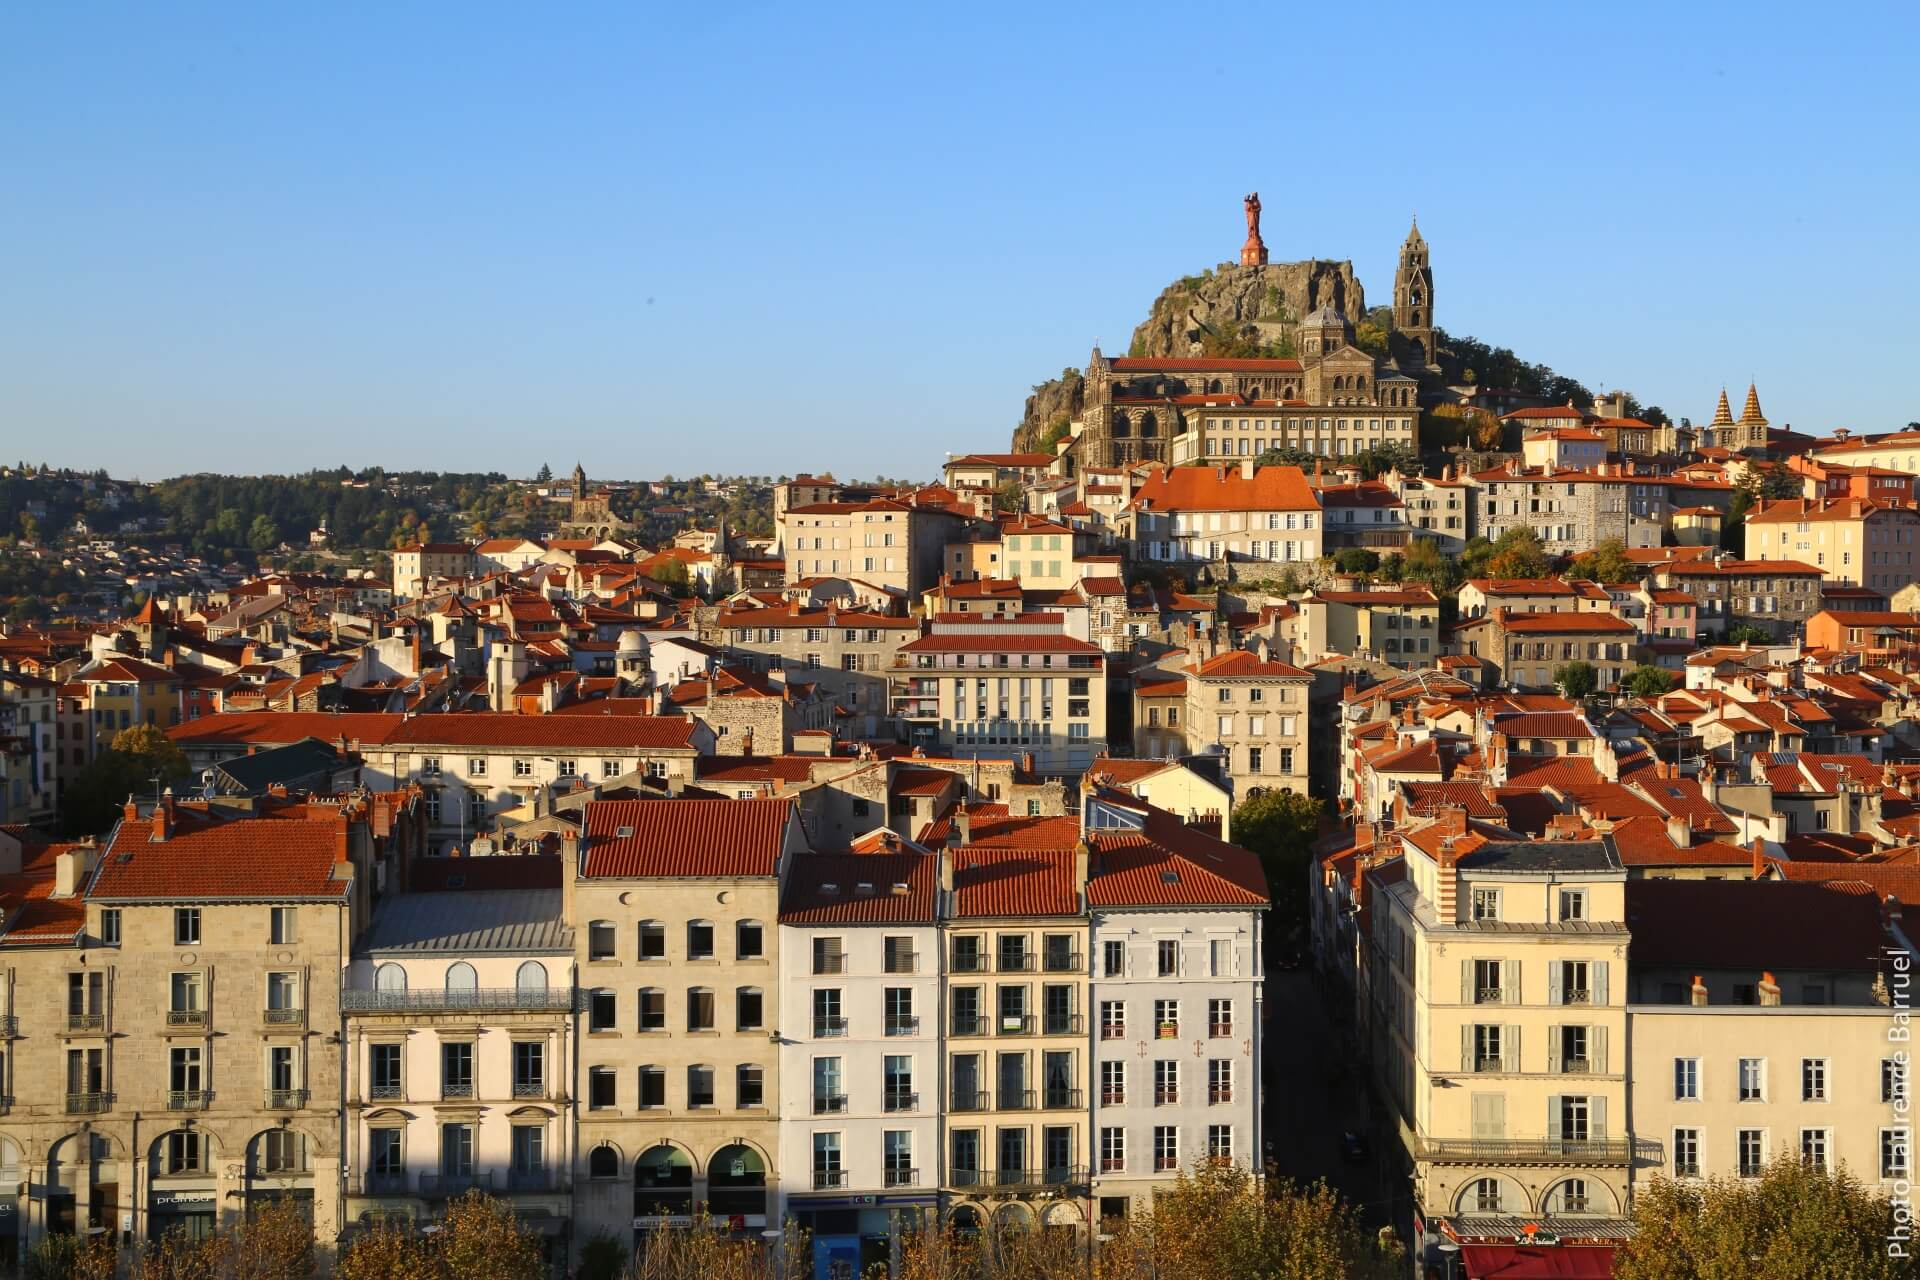 Puy-en-velay vieille ville rocher